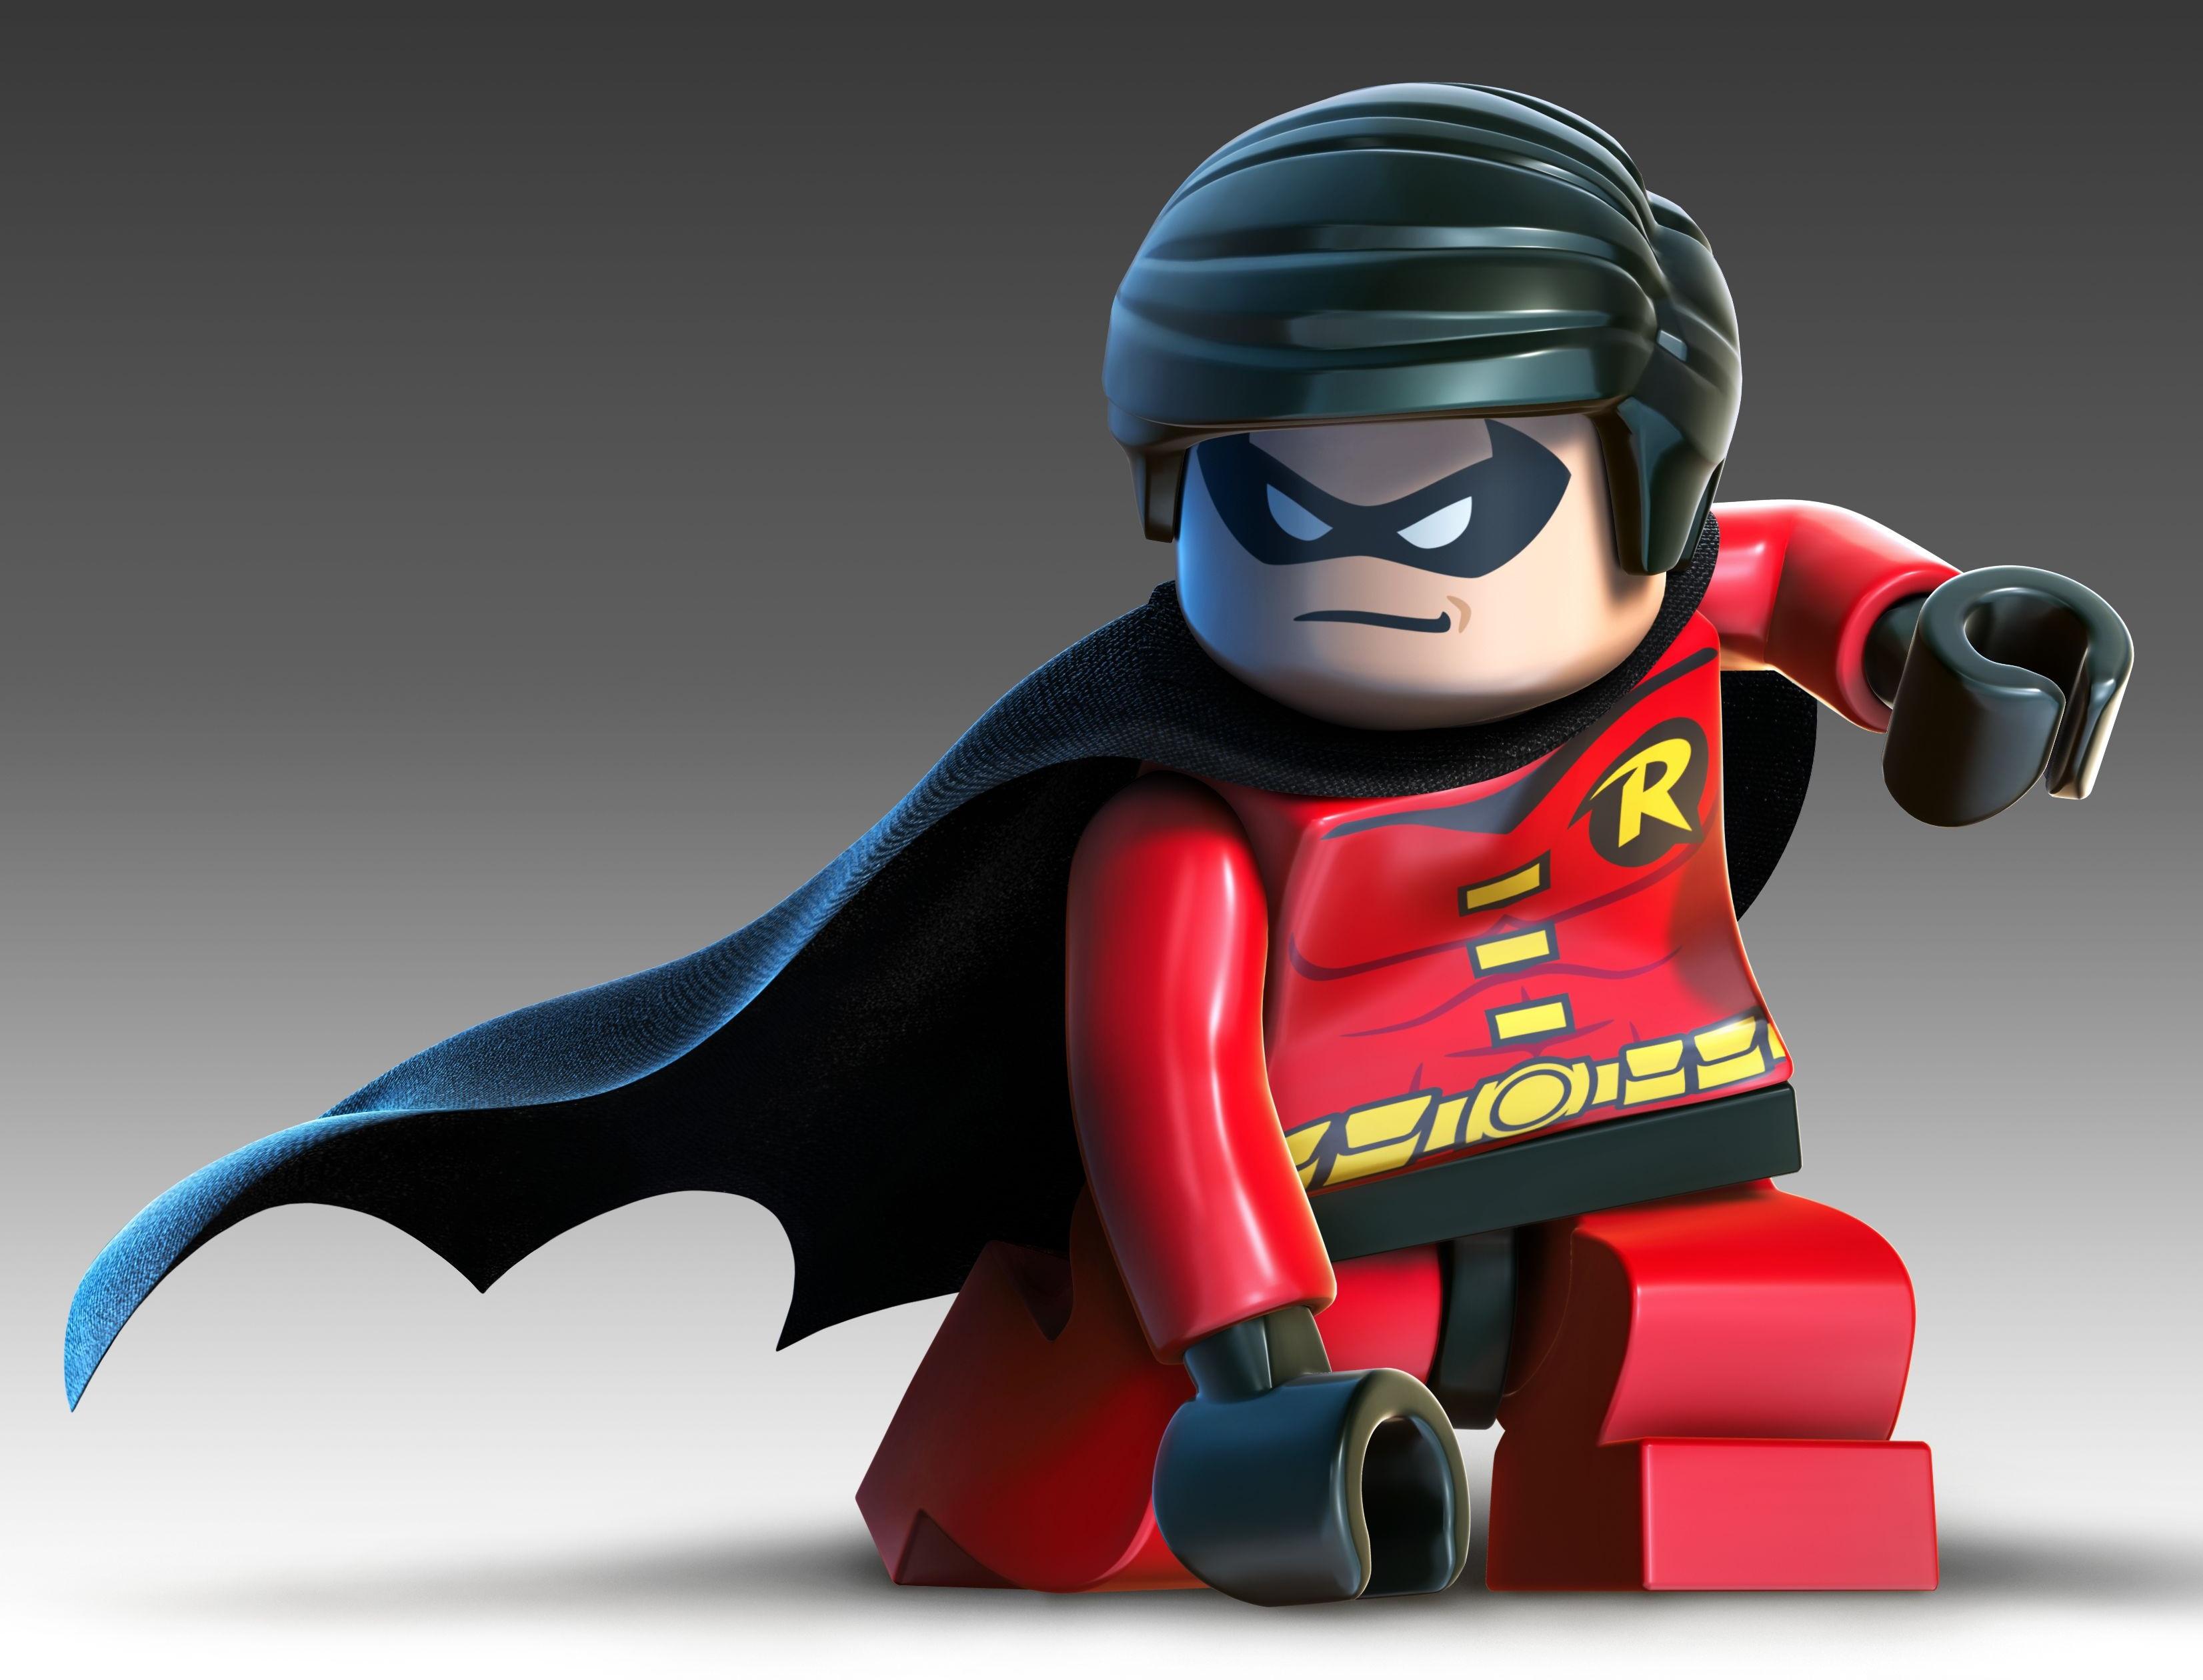 Robin Lego Video Games Batman Wiki Fandom